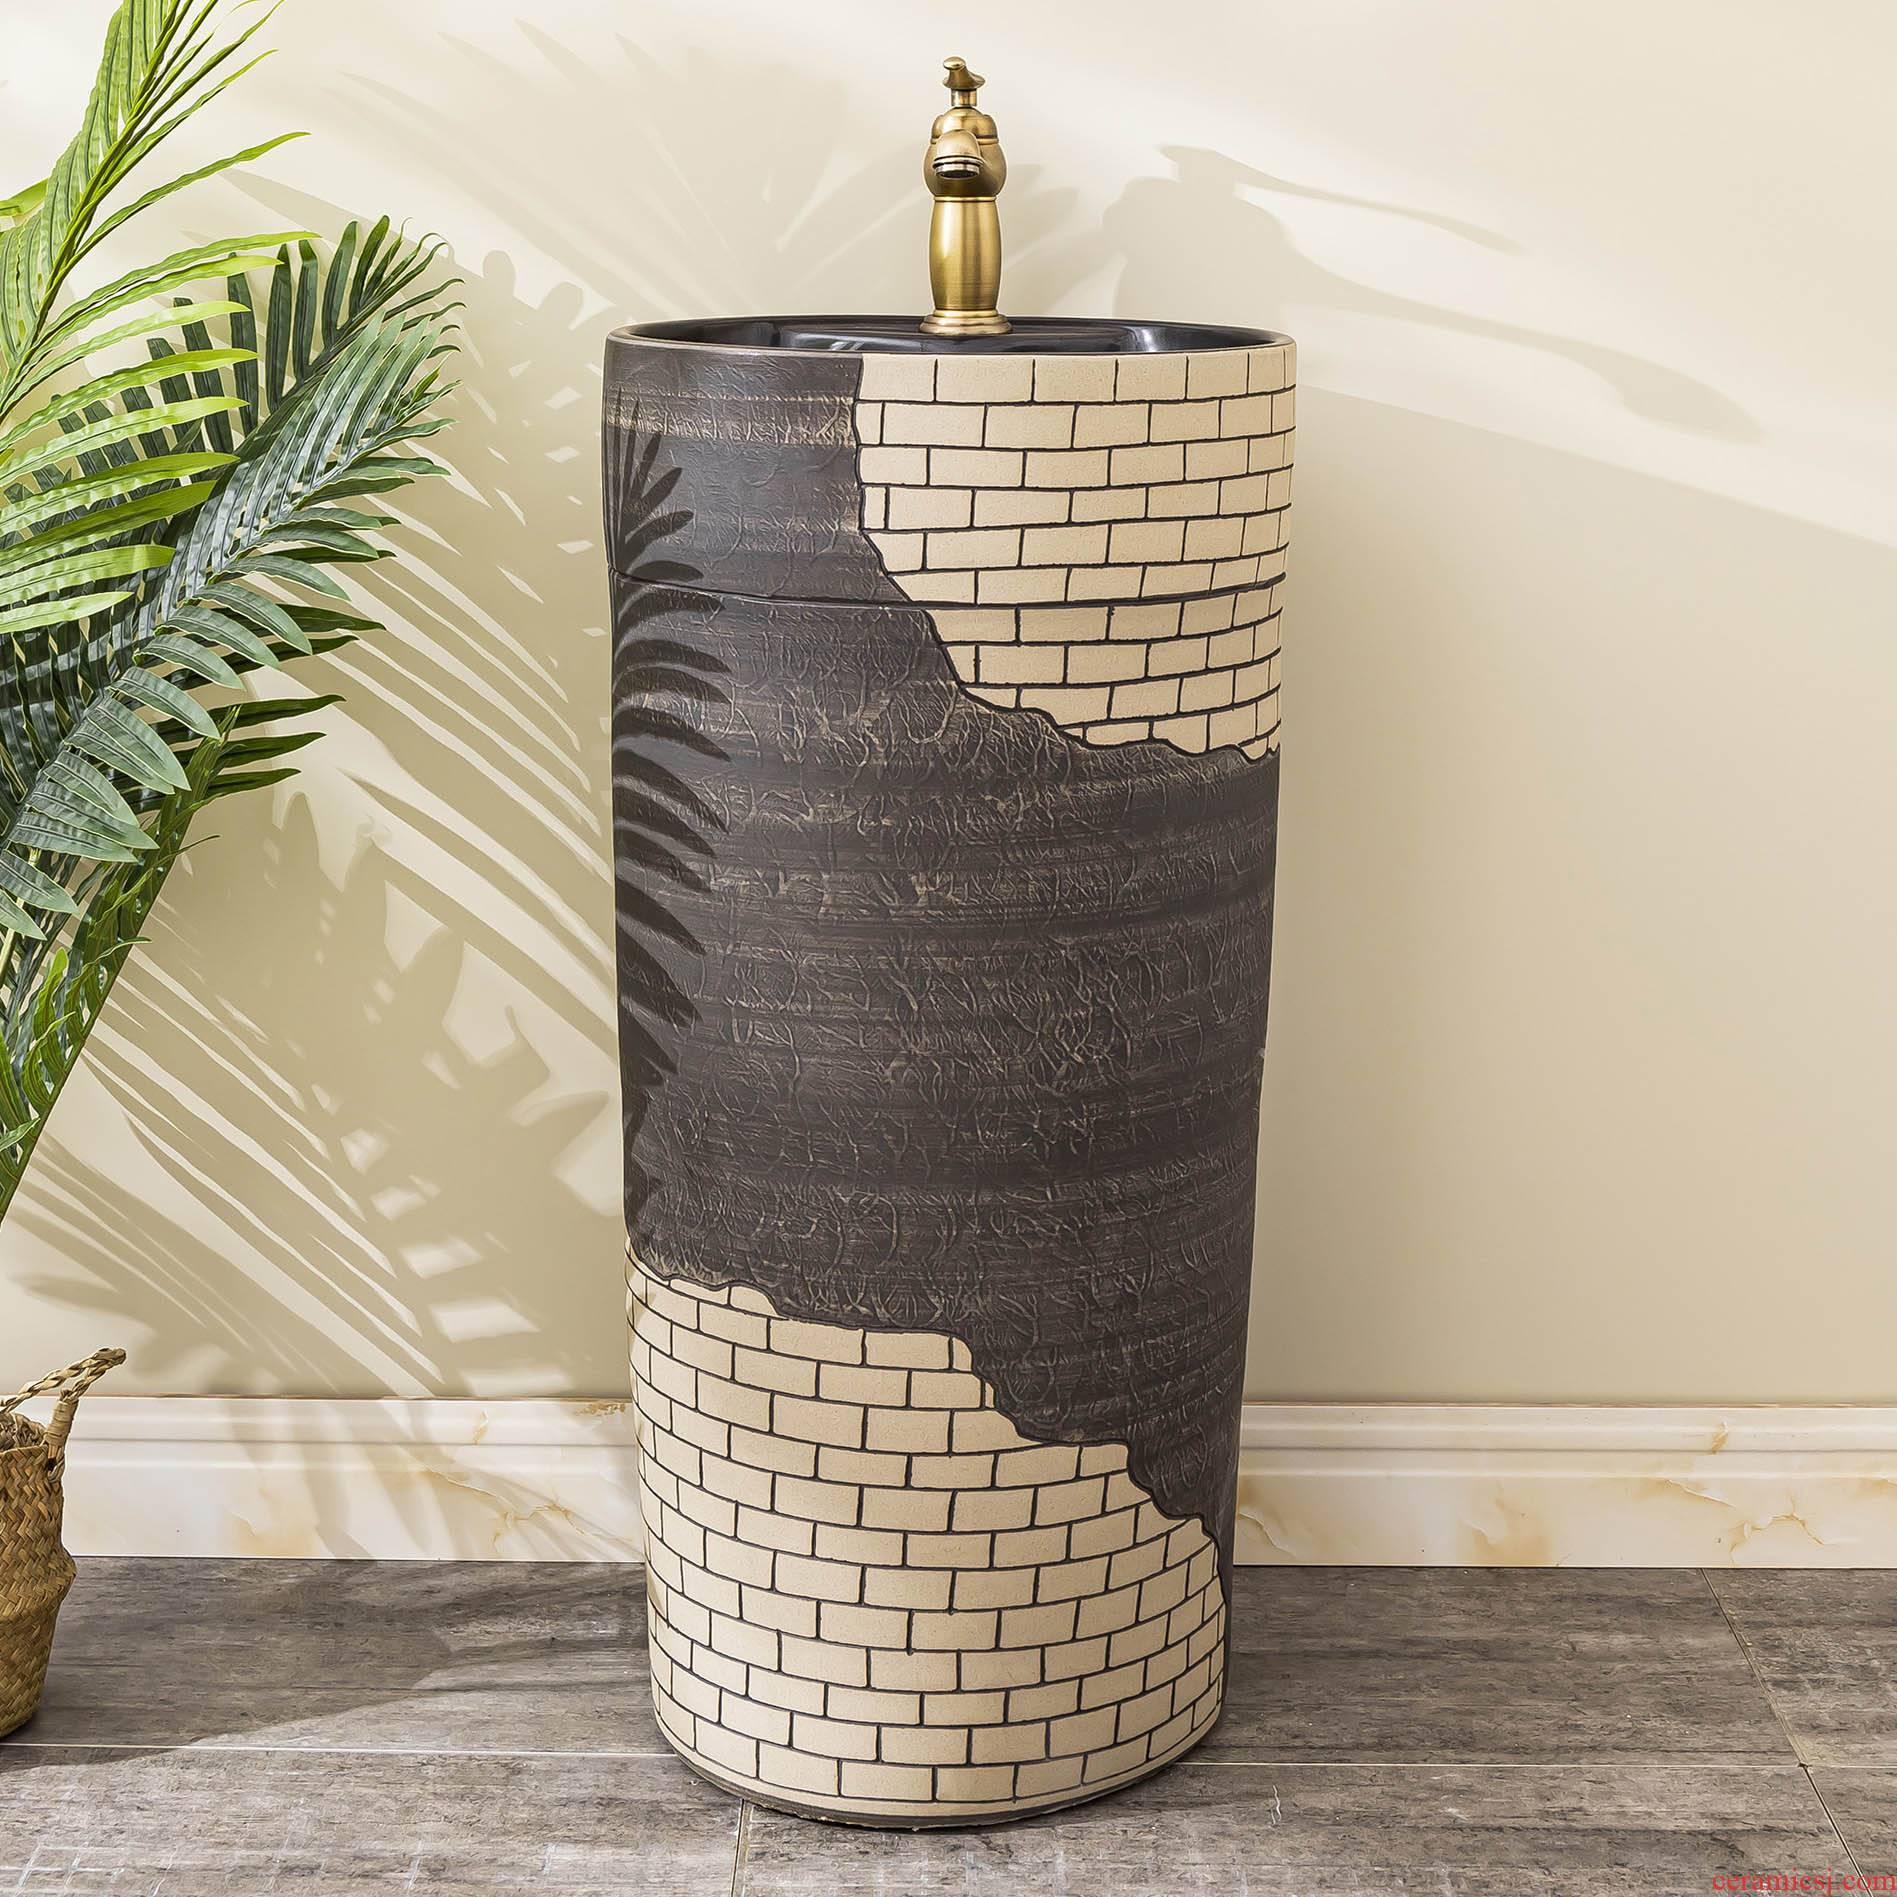 Ceramic floor pillar lavabo toilet lavatory basin balcony is suing household one column 1